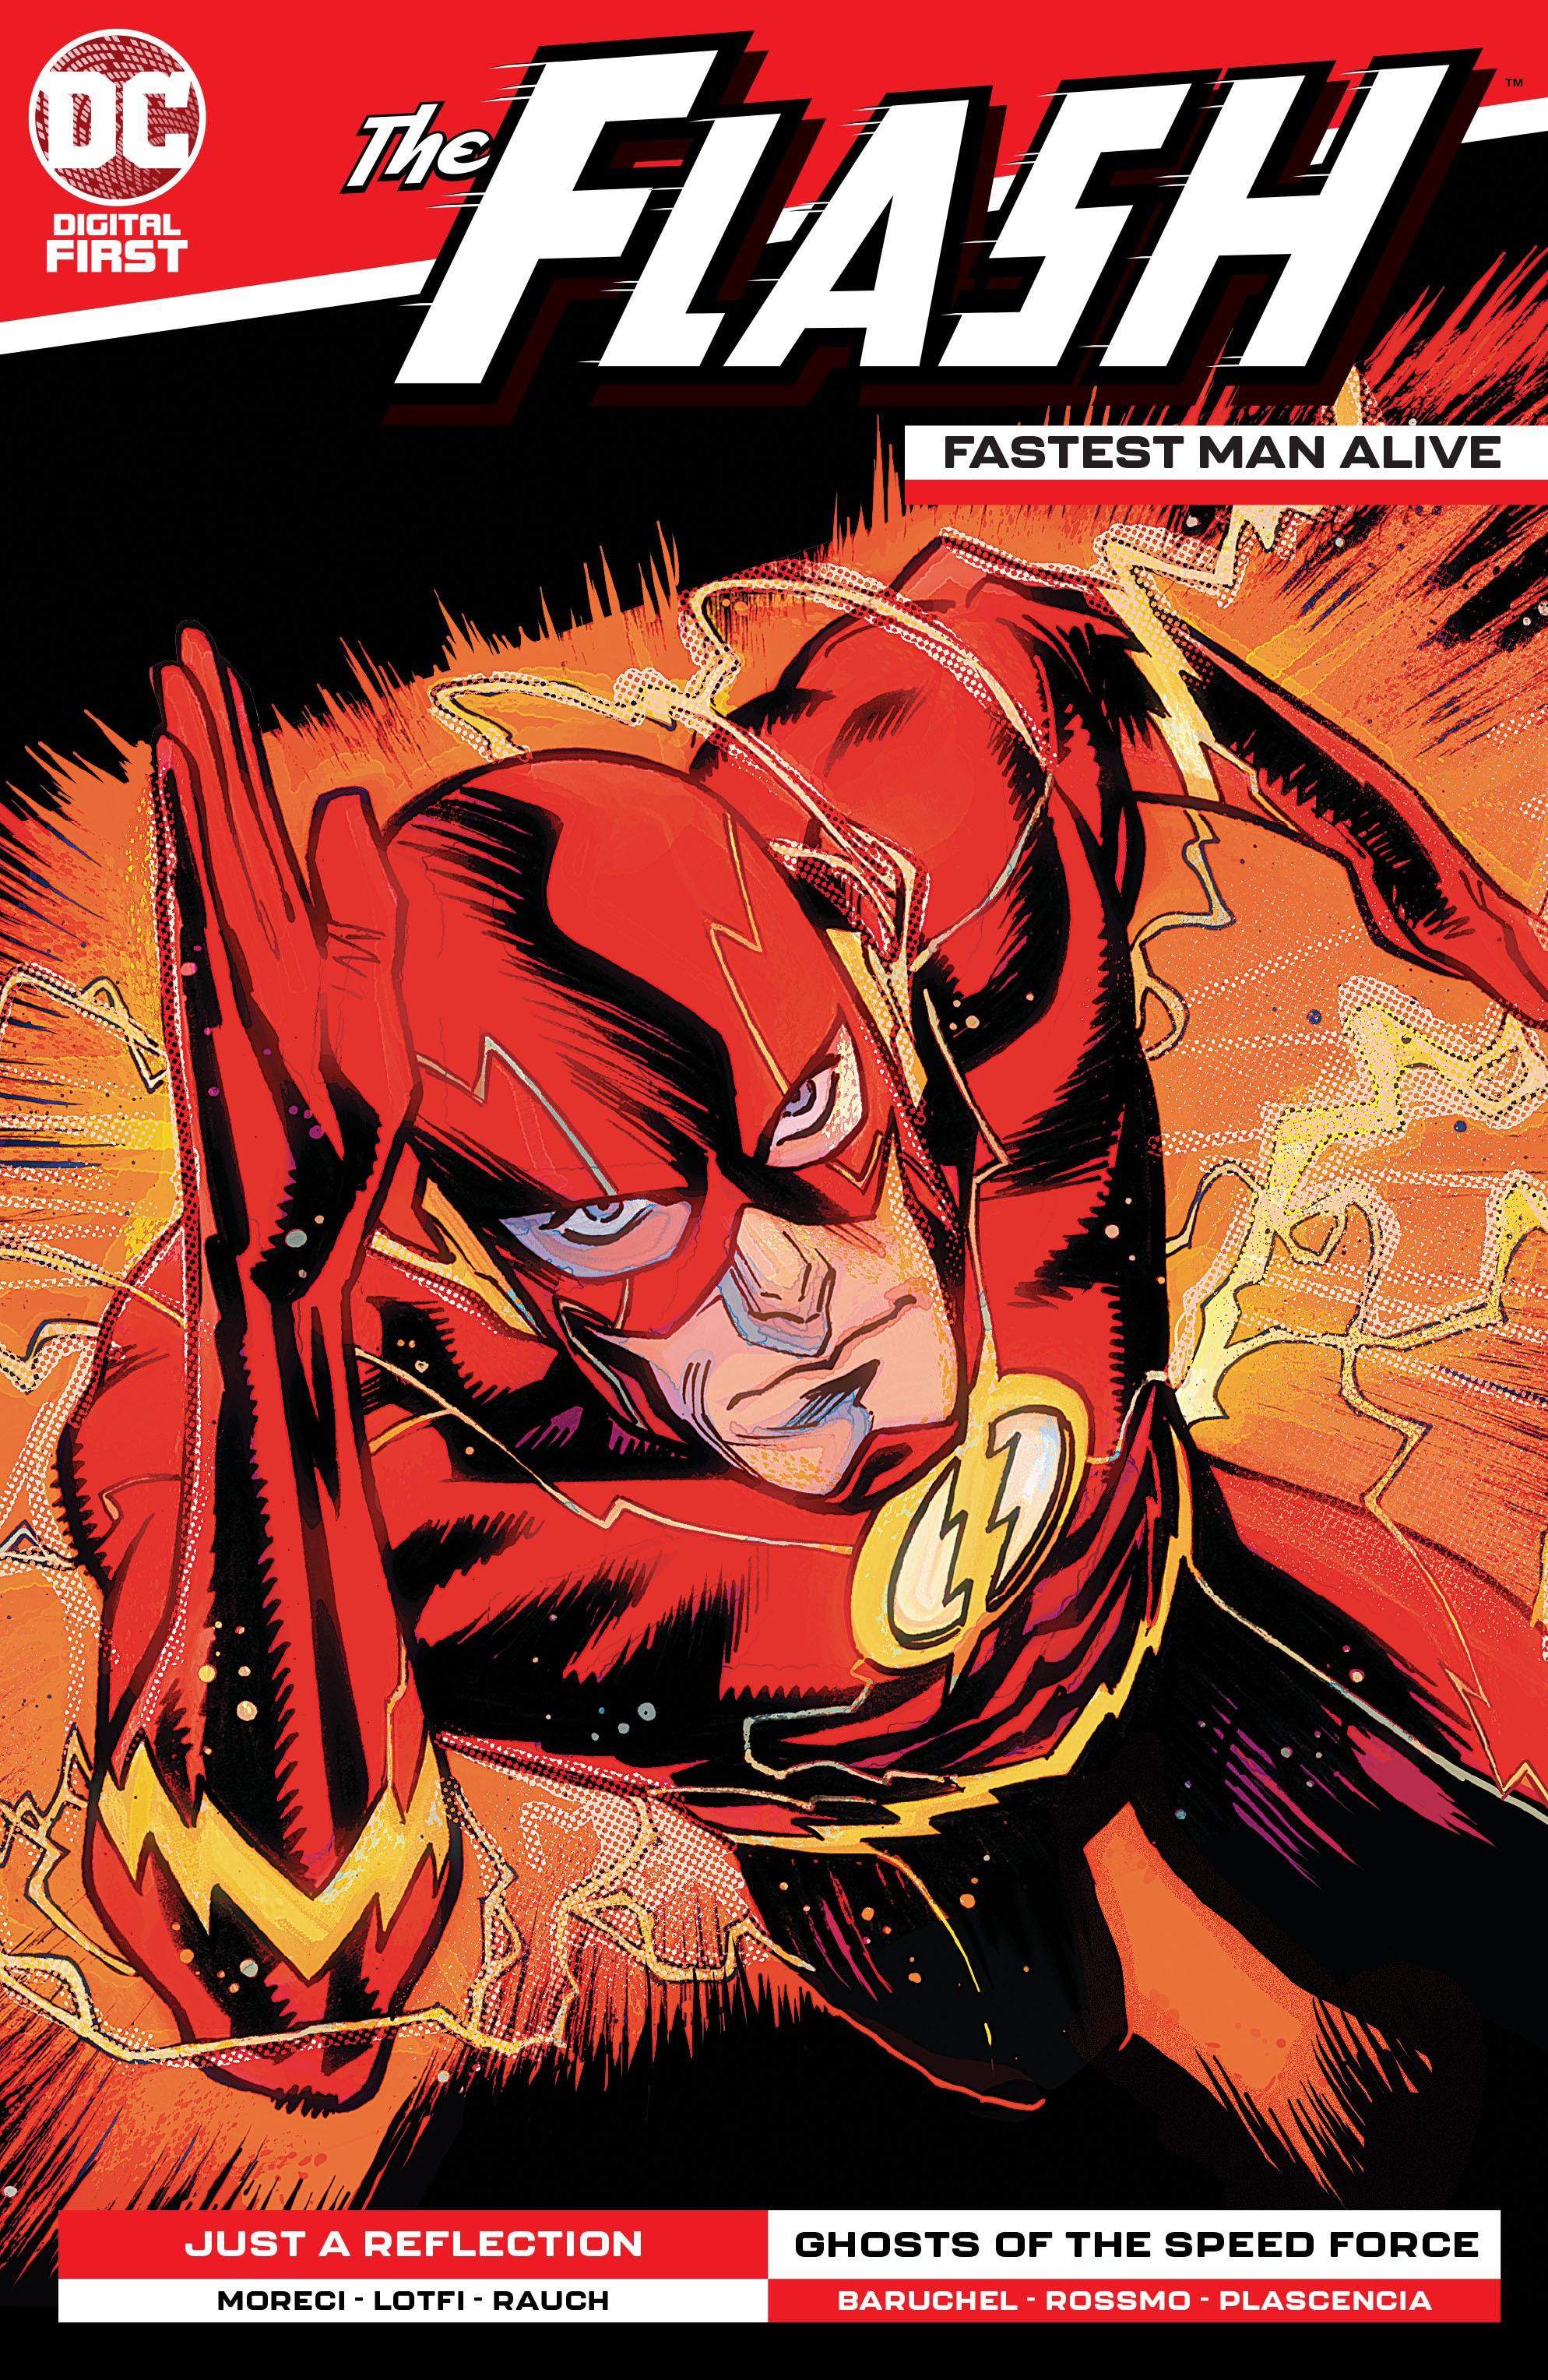 The Flash: Fastest Man Alive Vol 1 9 (Digital)